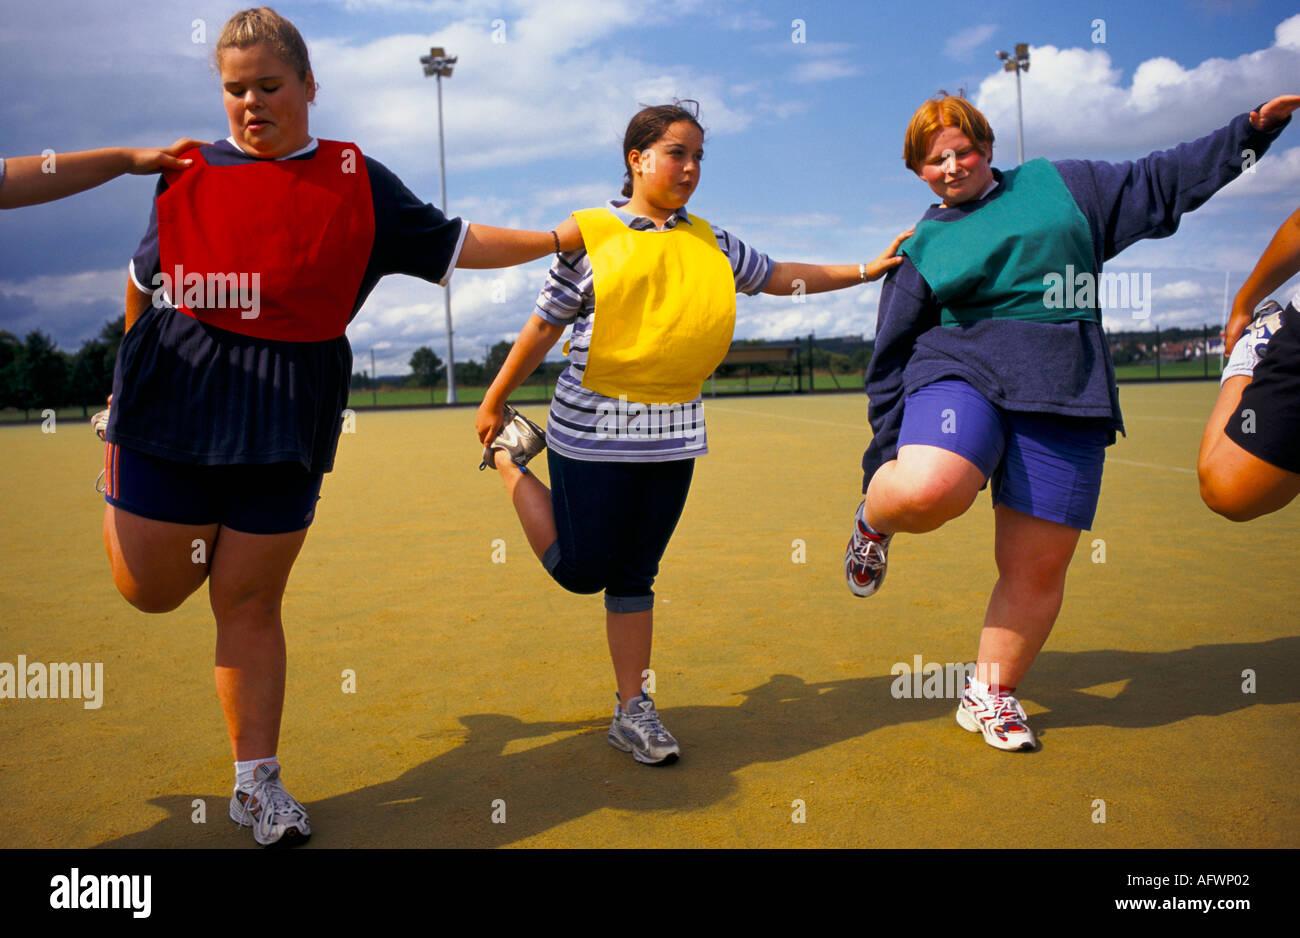 Remarkable, amusing mature adult fat camp